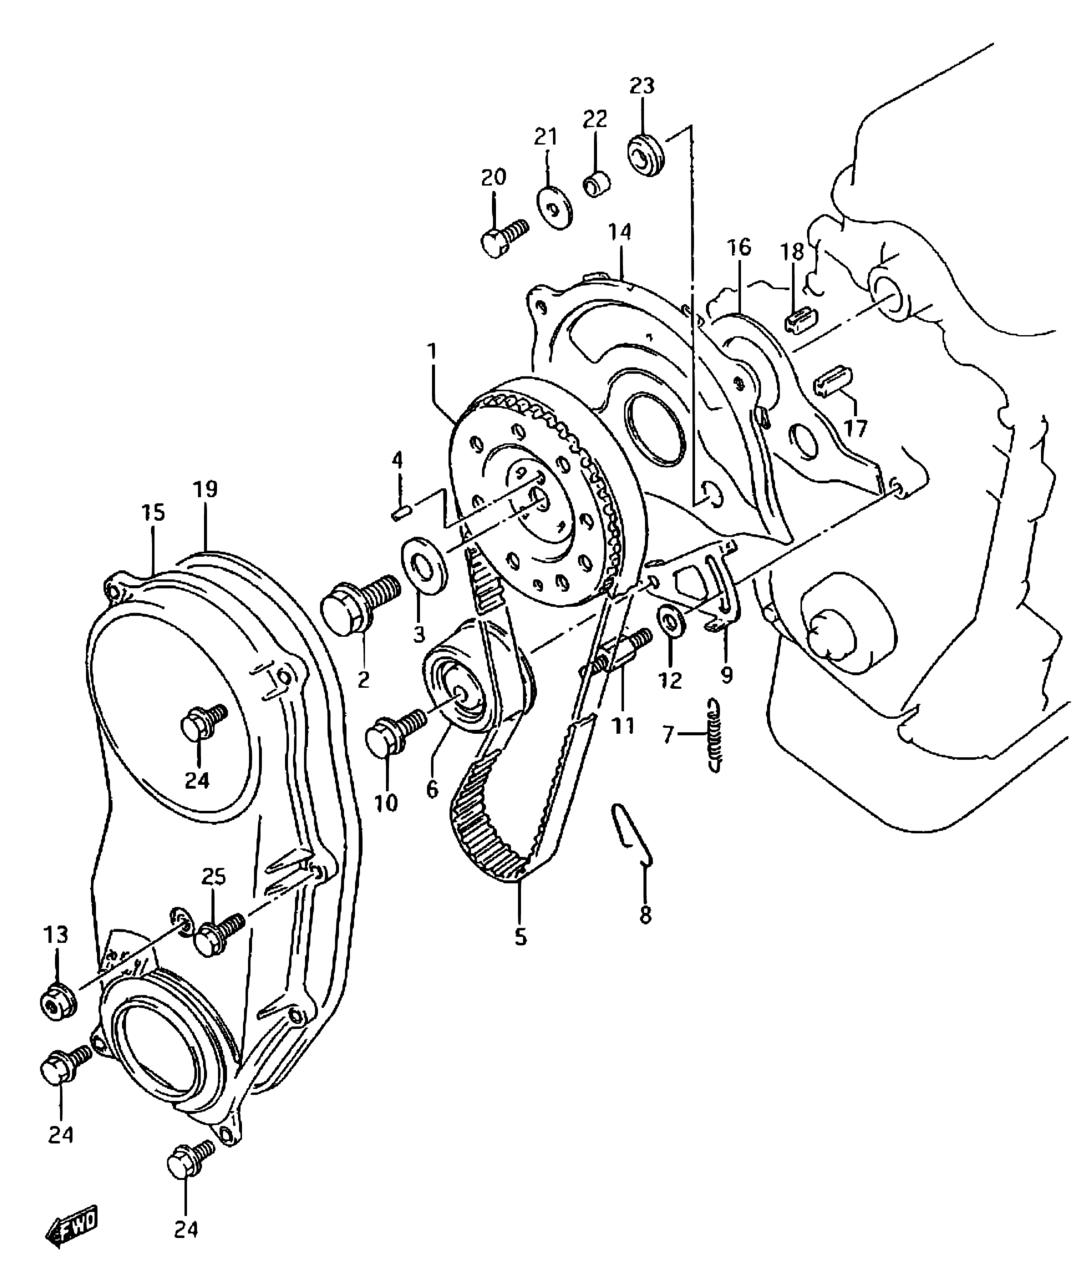 Suzuki Samurai Timing Belt Diagram For Engine Wiring Library United States Sj Sj413 E03e33my 1989 8